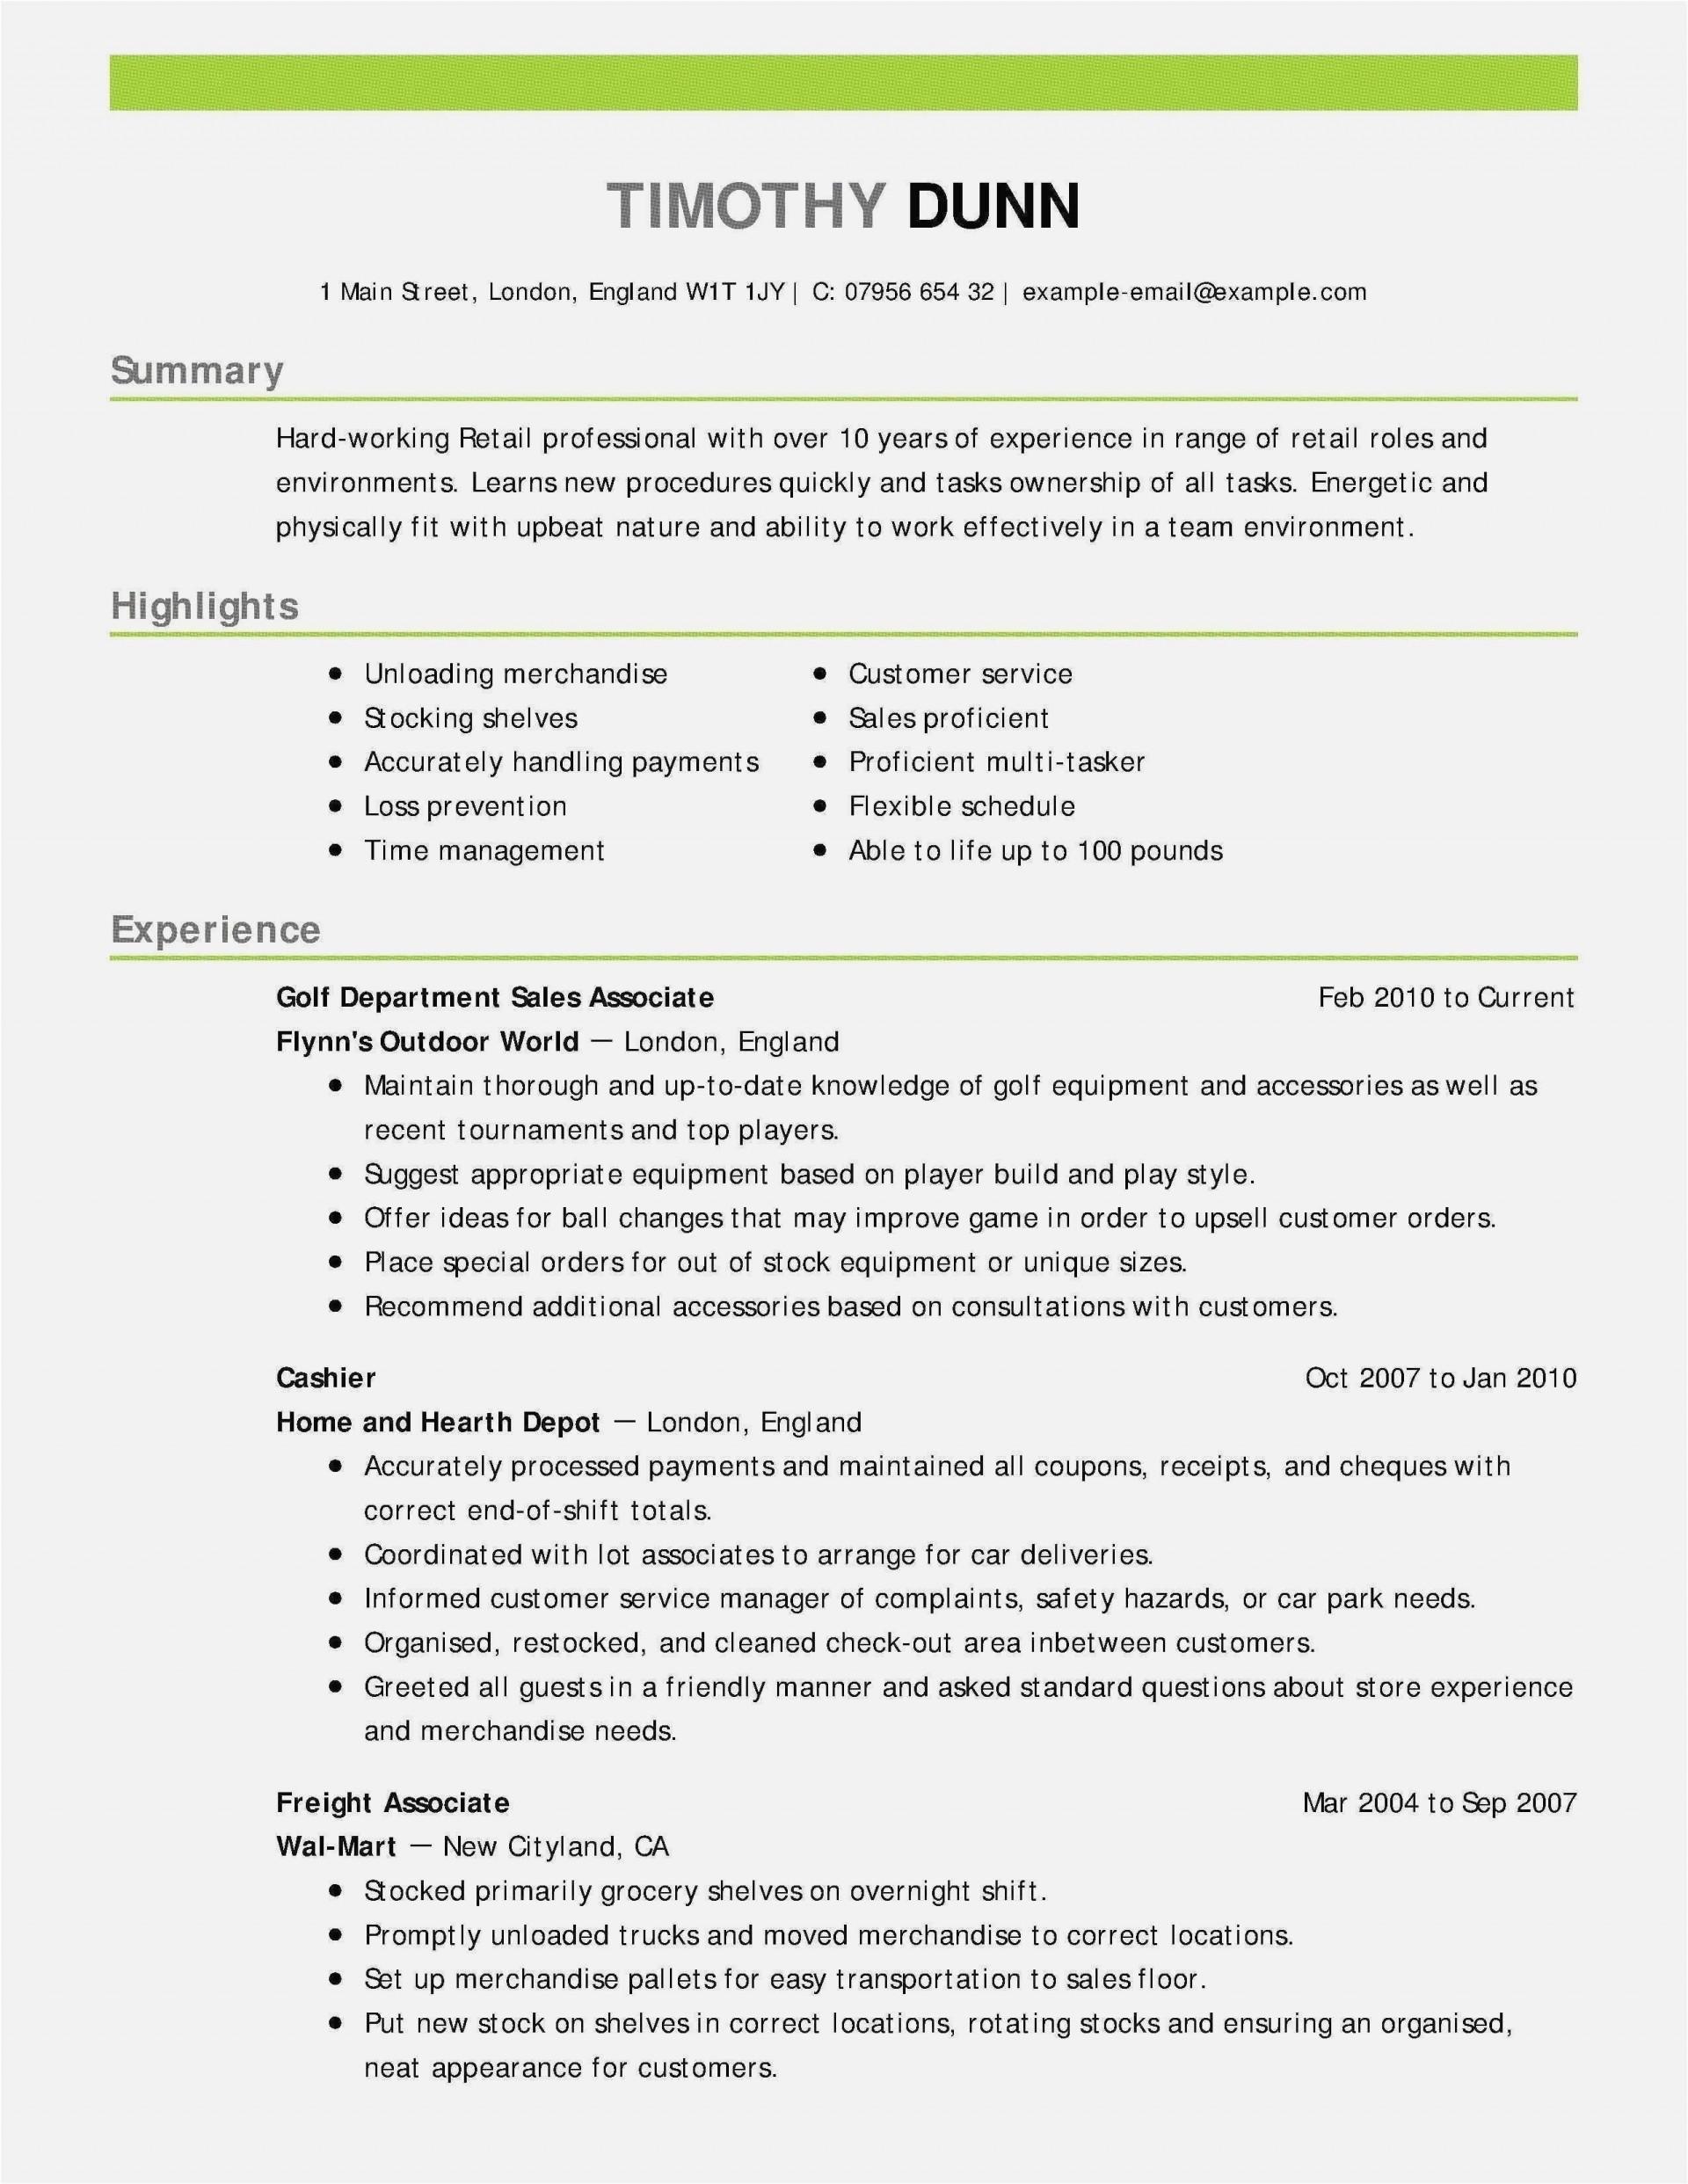 002 Incredible Customer Service Resume Template Idea  Templates Best Cv Free Representative1920